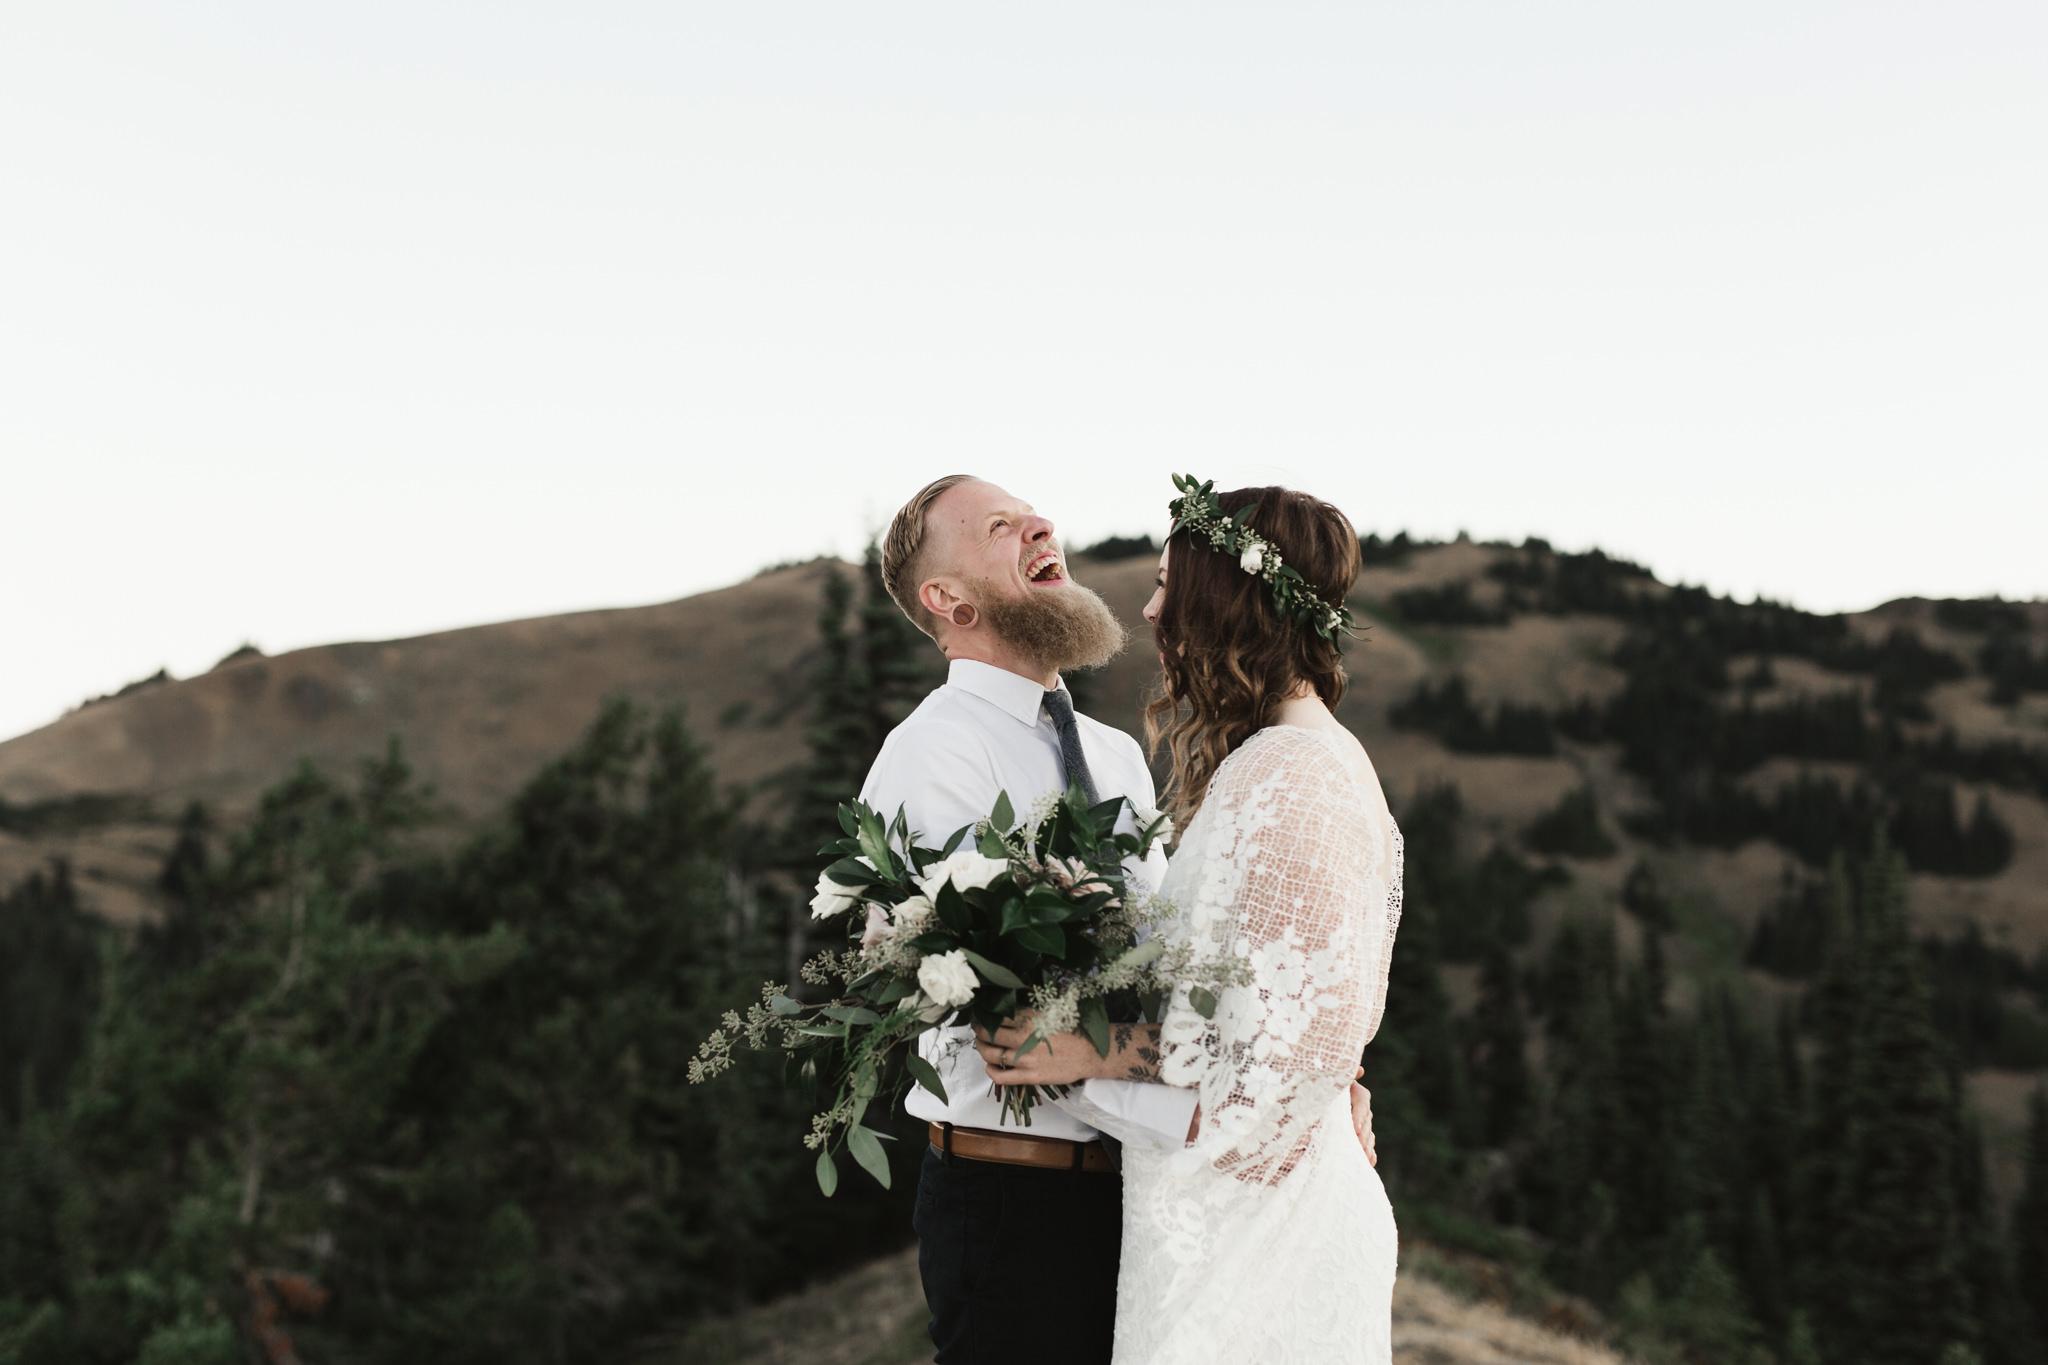 Jesse-Kasie-Hurricane-Ridge-Wedding-29.jpg